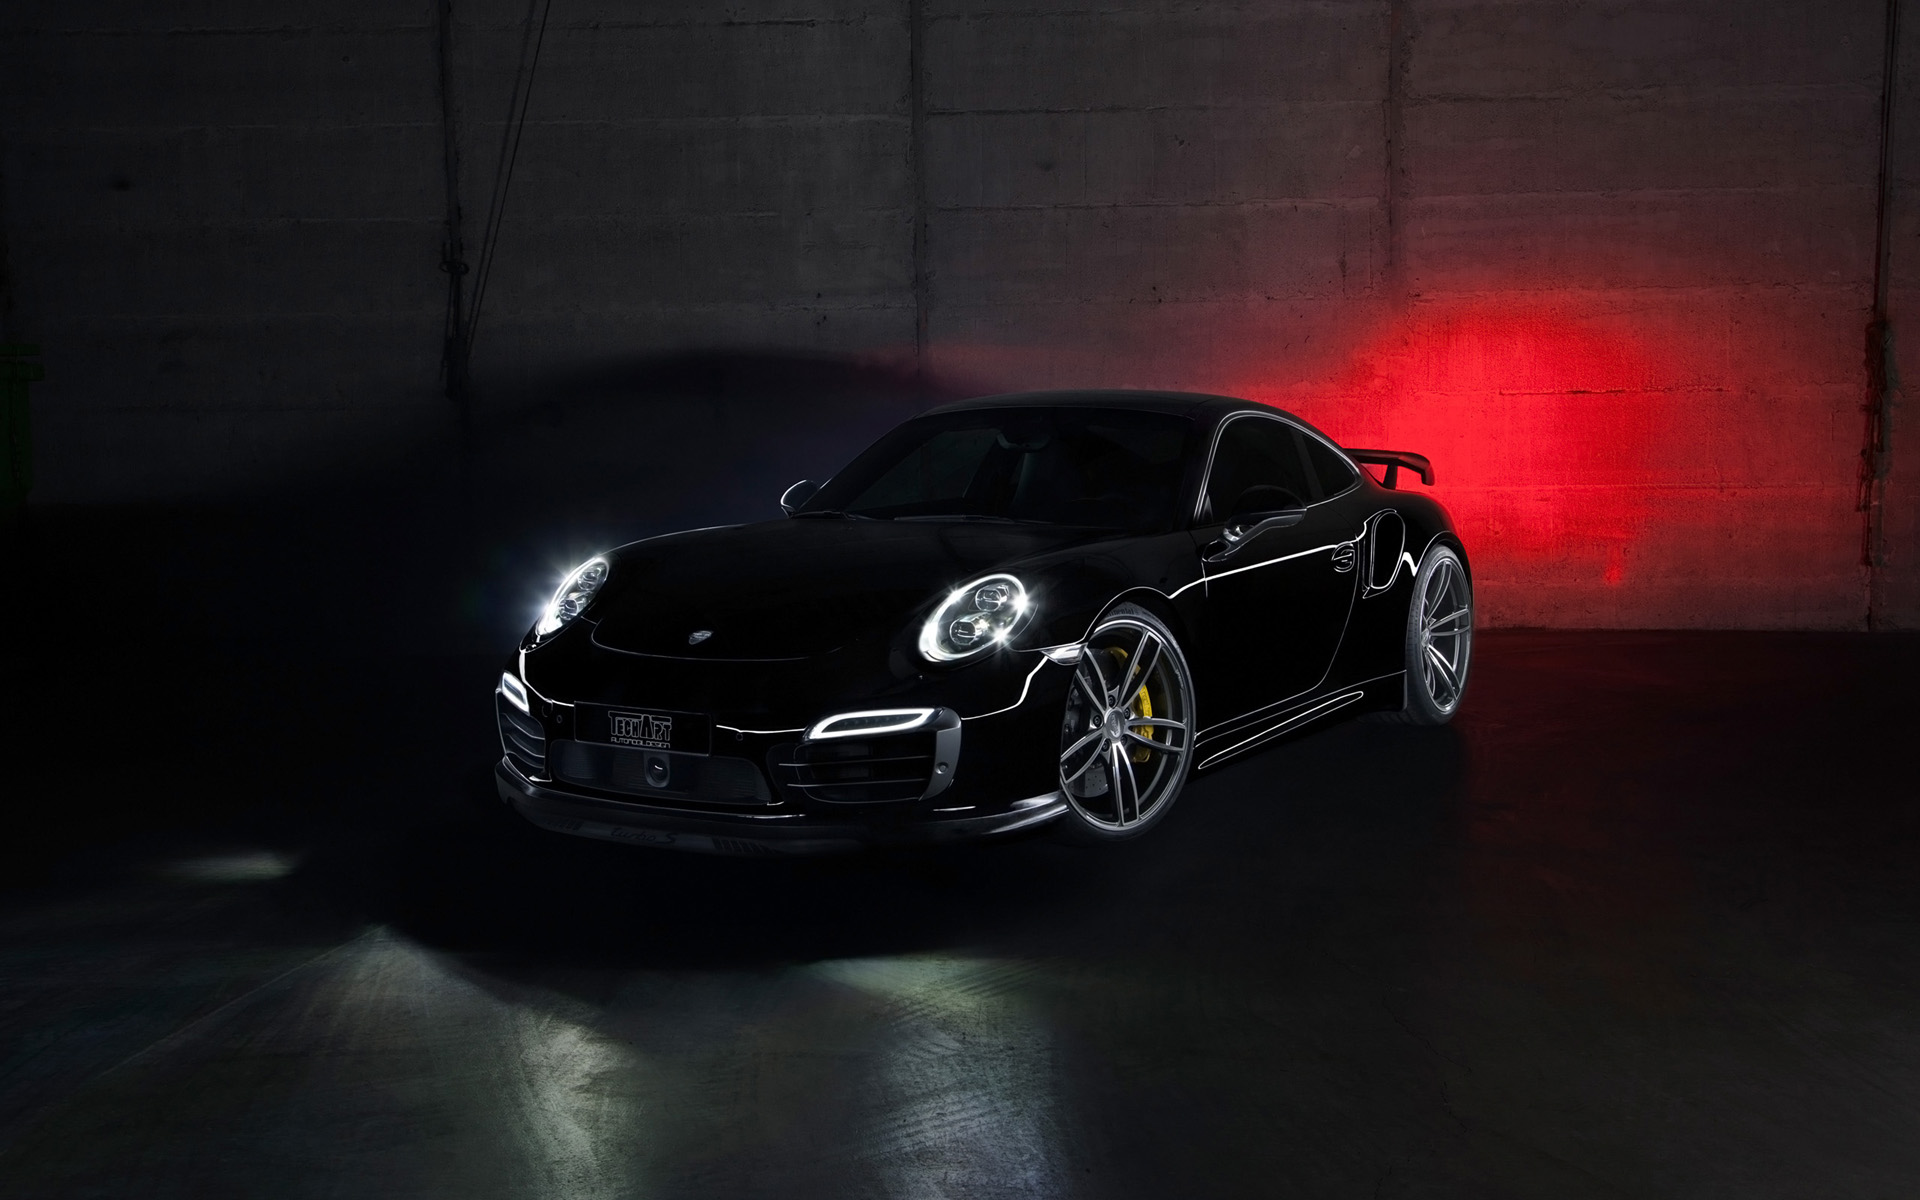 2013 Techart 911 Turbo News And Information